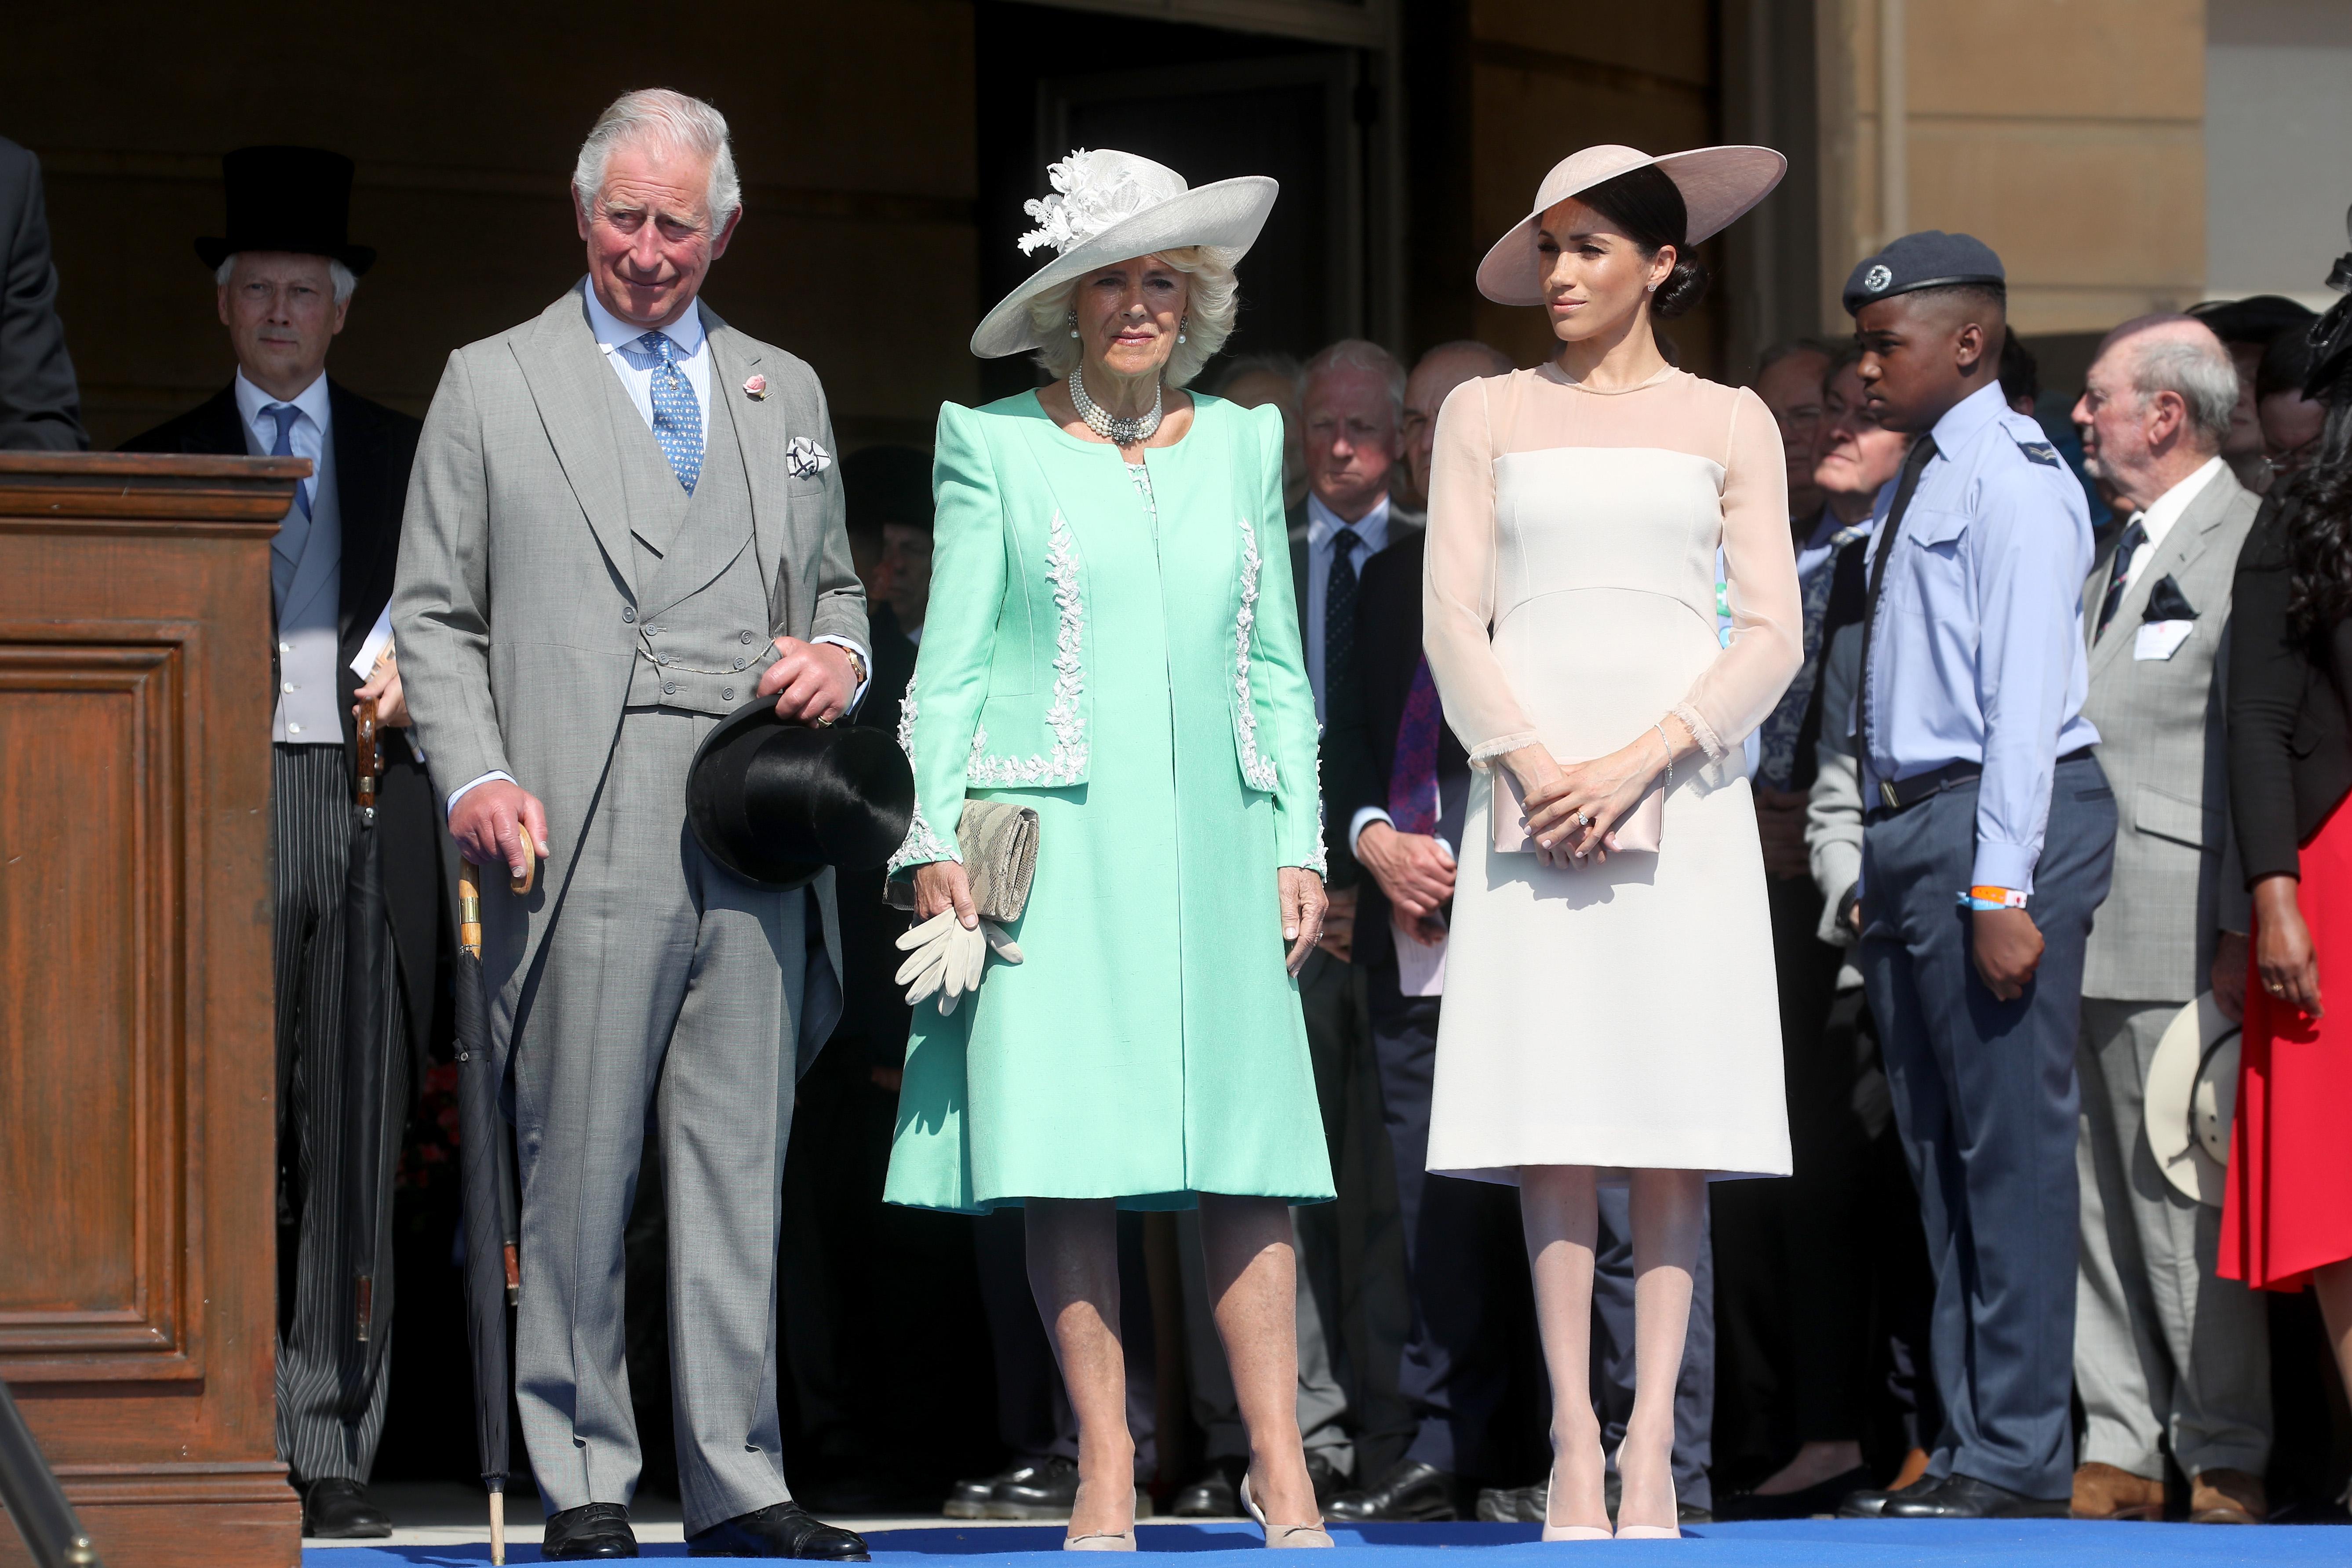 The Prince Of Wales 70th Birthday Patronage Celebration